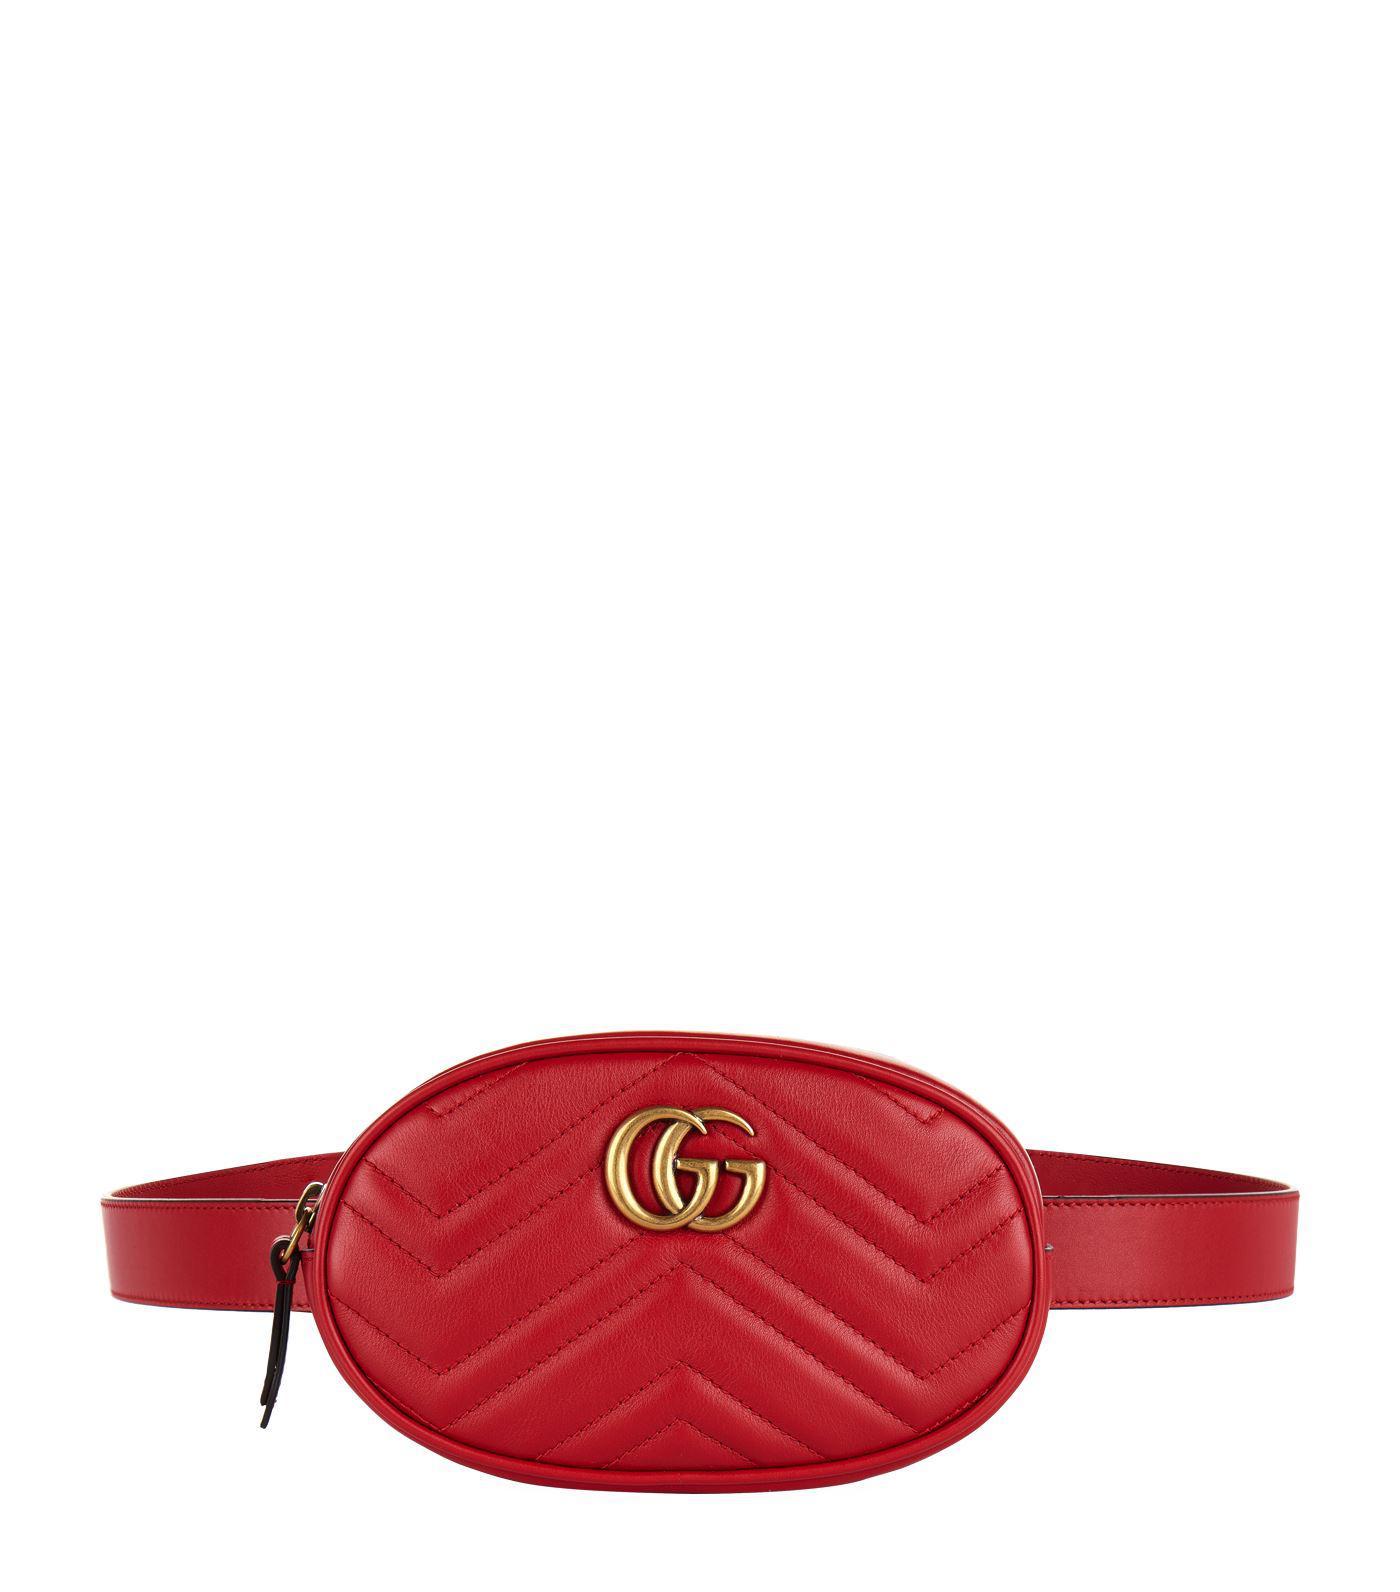 67f170b842f9ca Gucci GG Marmont Matelassé Belt Bag in Red - Save 17% - Lyst